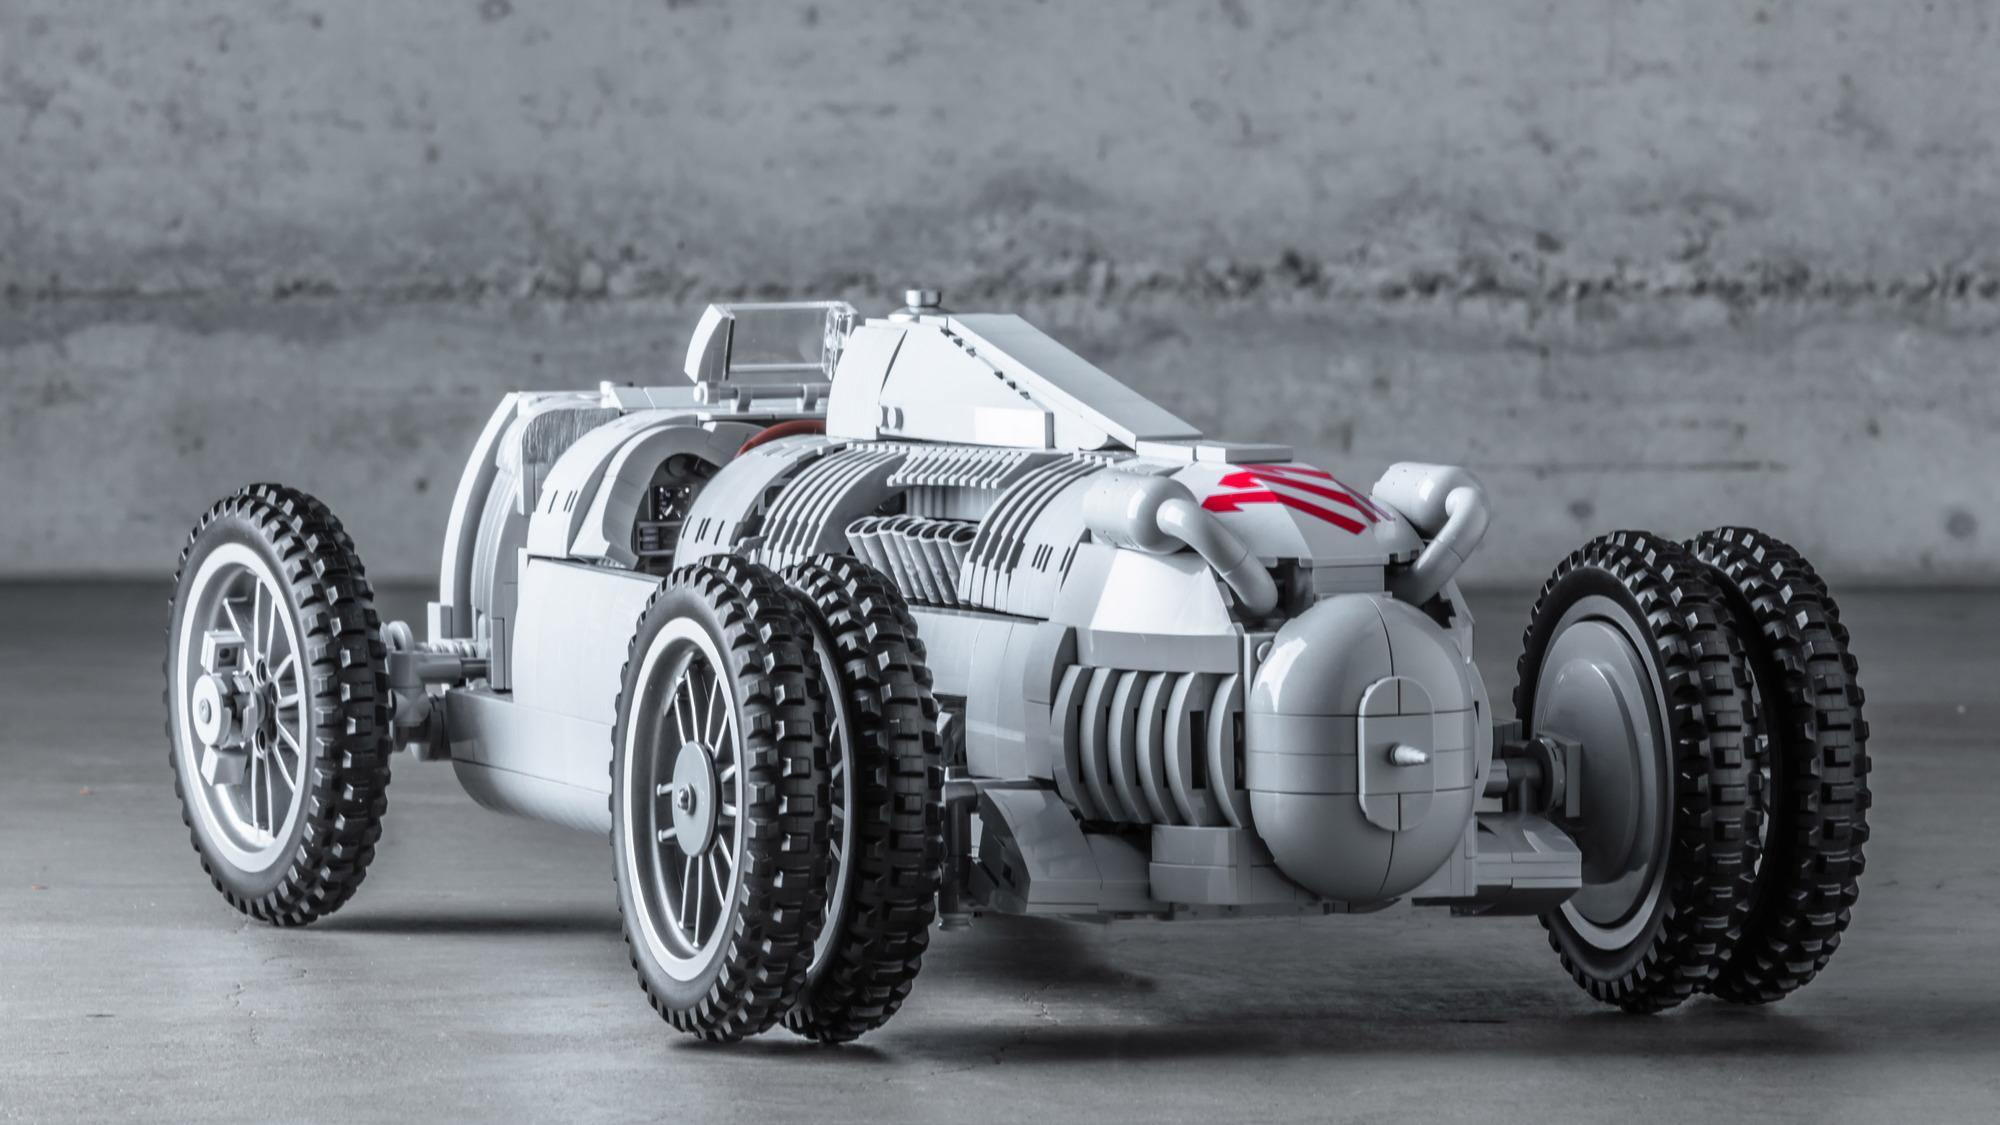 1936 Auto Union Lego race car